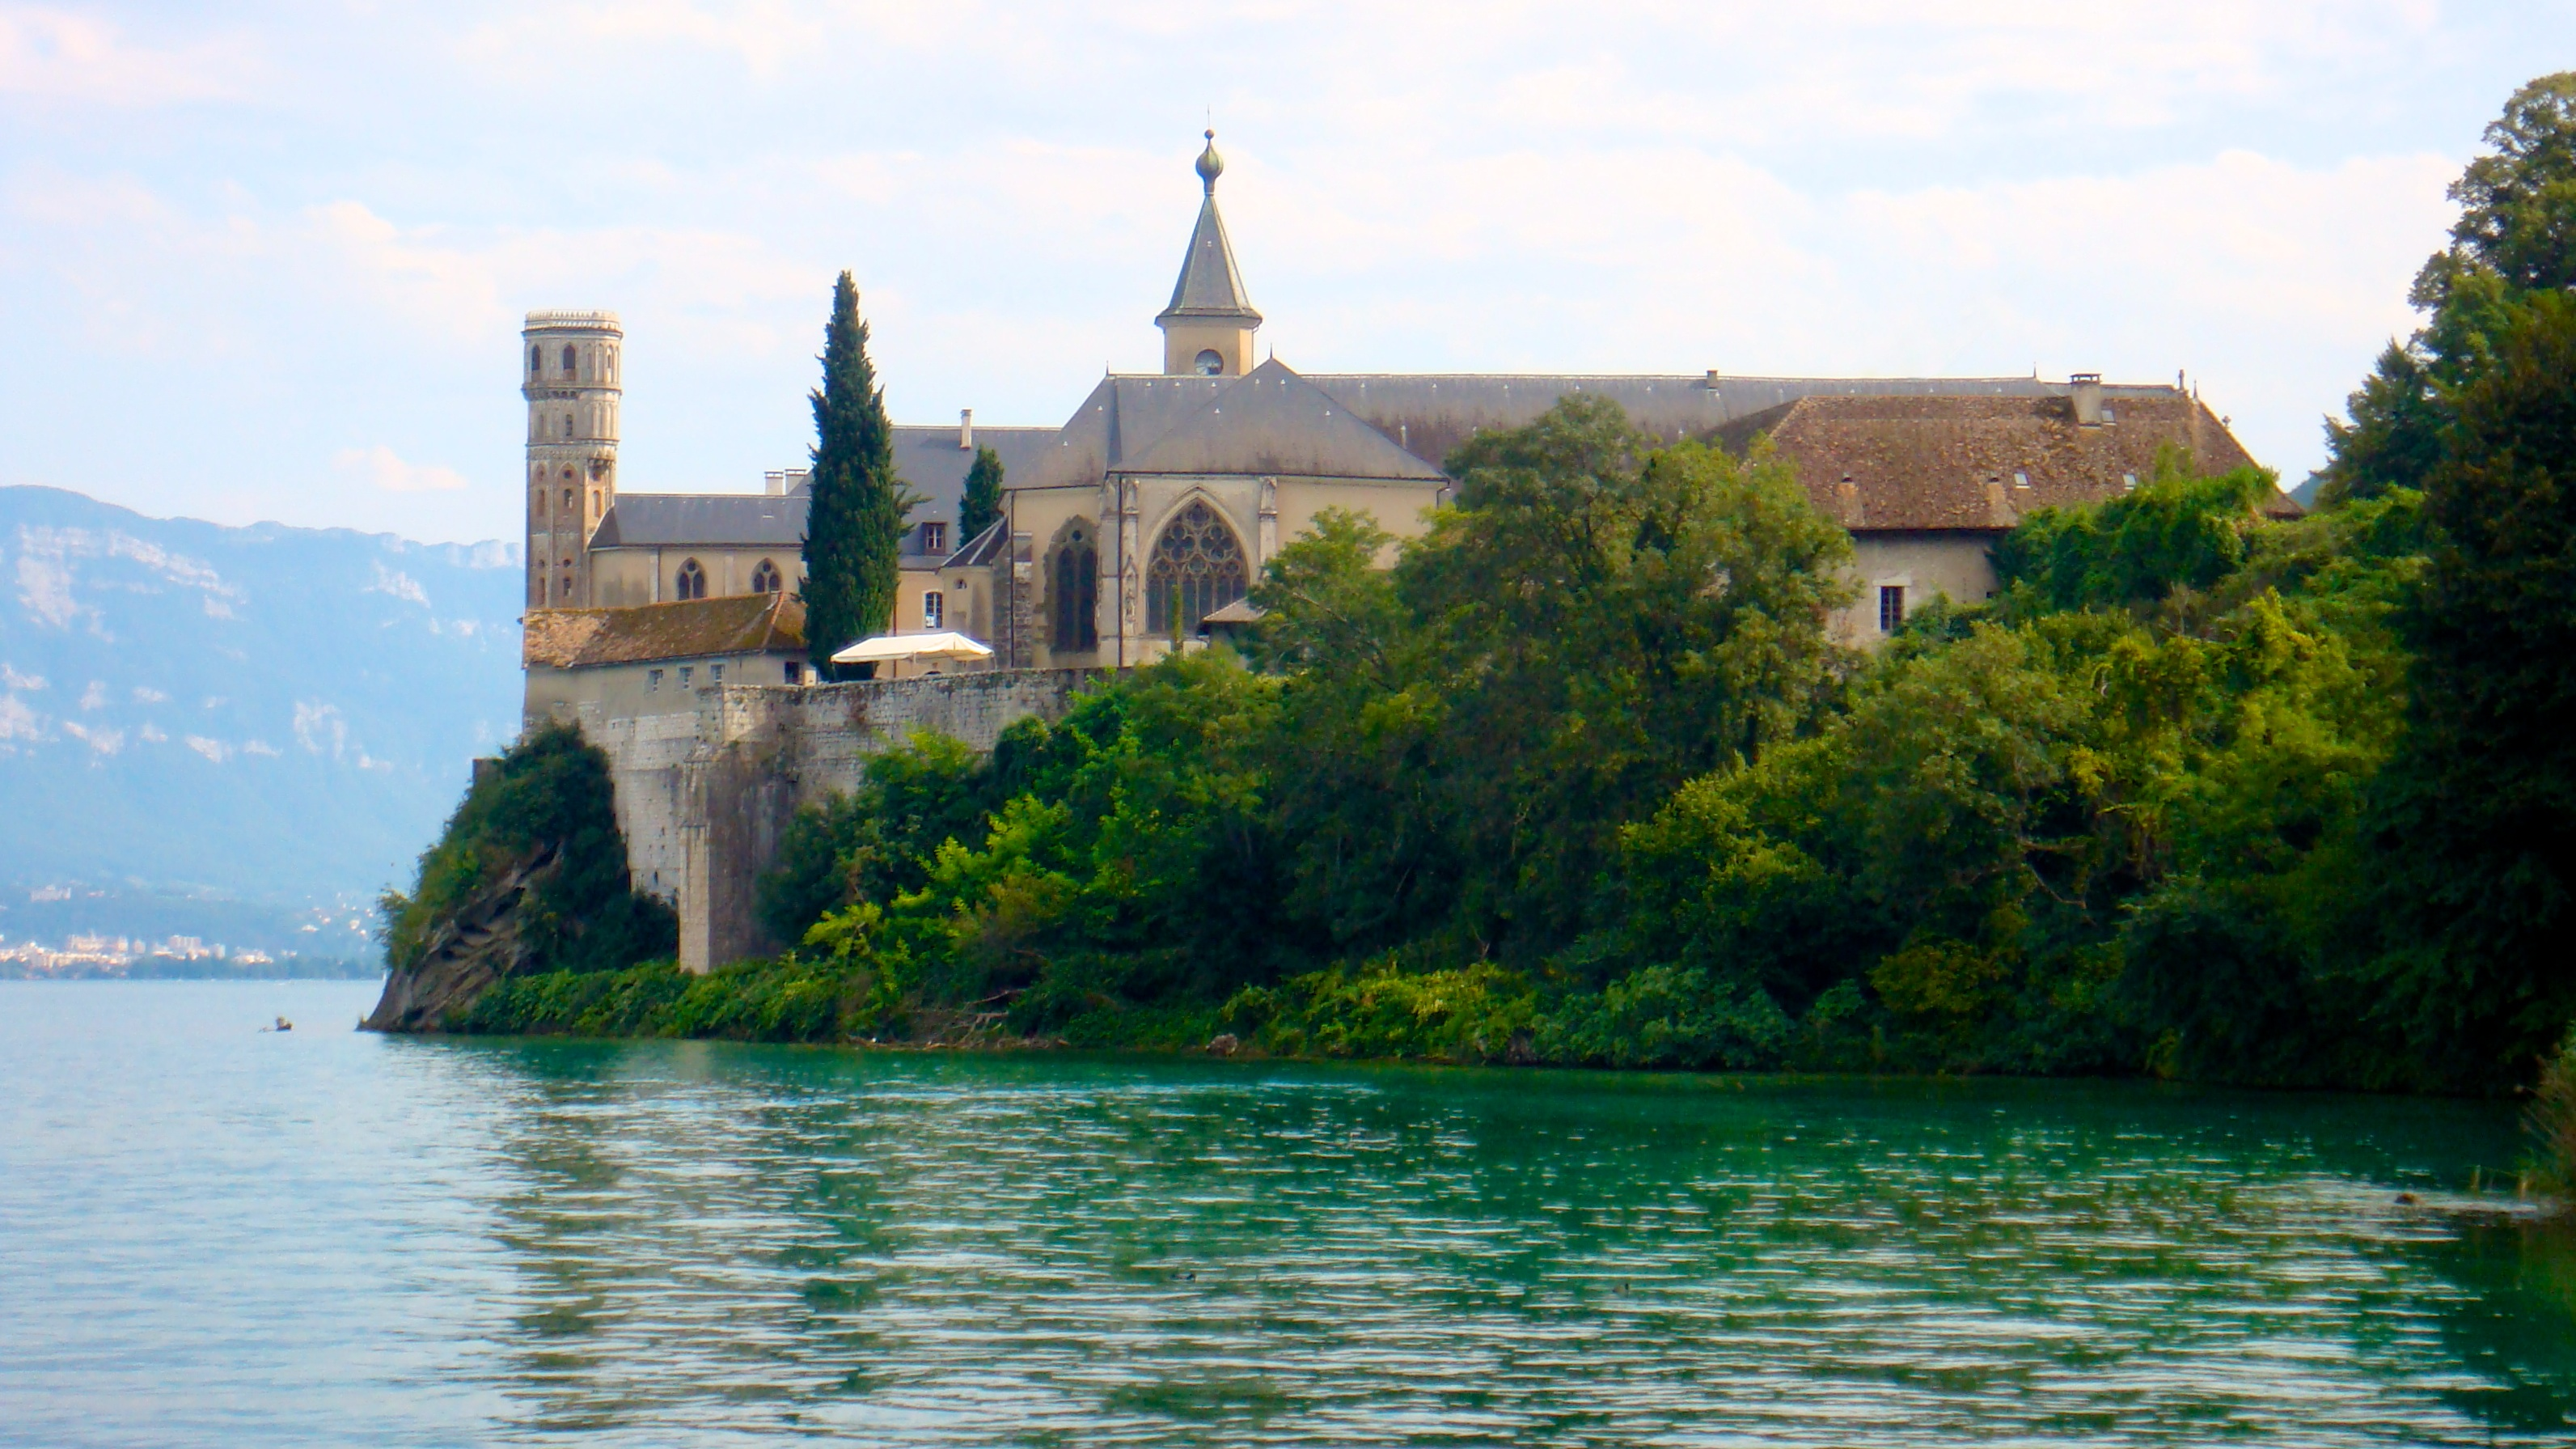 Abbaye royale d'Hautecombe, Savoie, Auvergne-Rhône-Alpes, France [3185x1781]